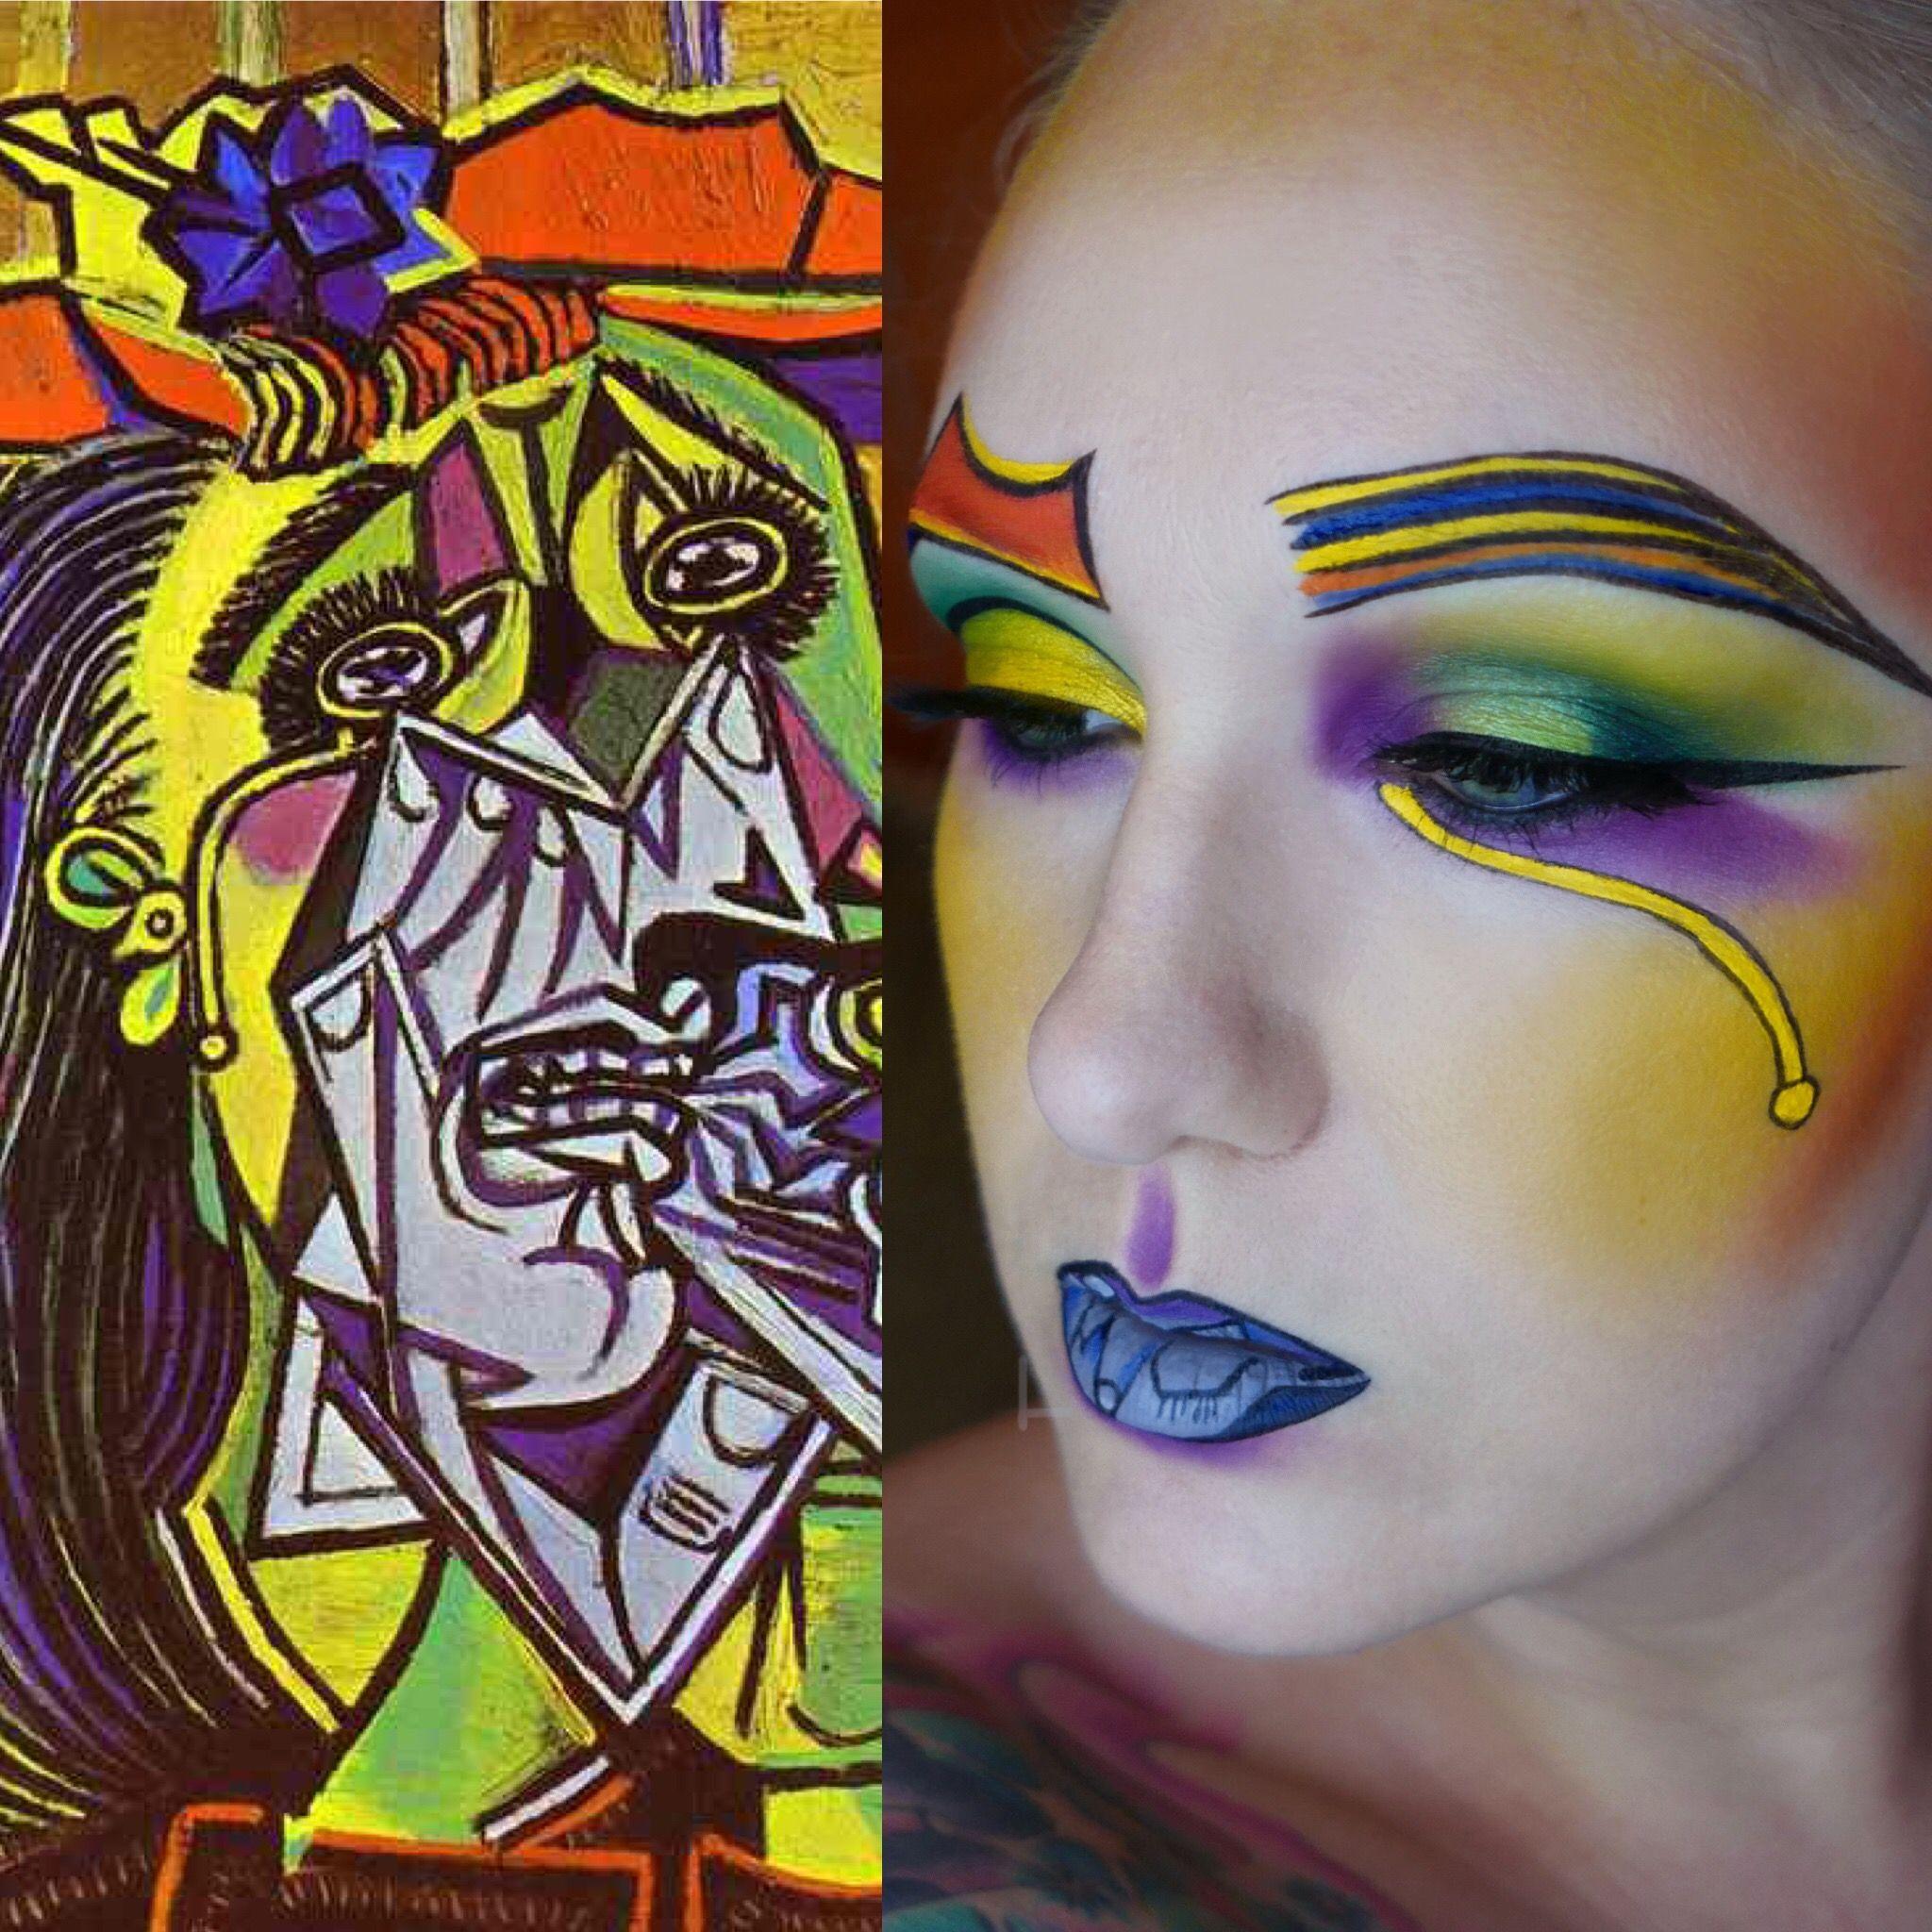 Artist Inspiration Series 3 Picasso The Weeping Woman Makeup Beauty Artistry Makeup Fantasy Makeup Makeup